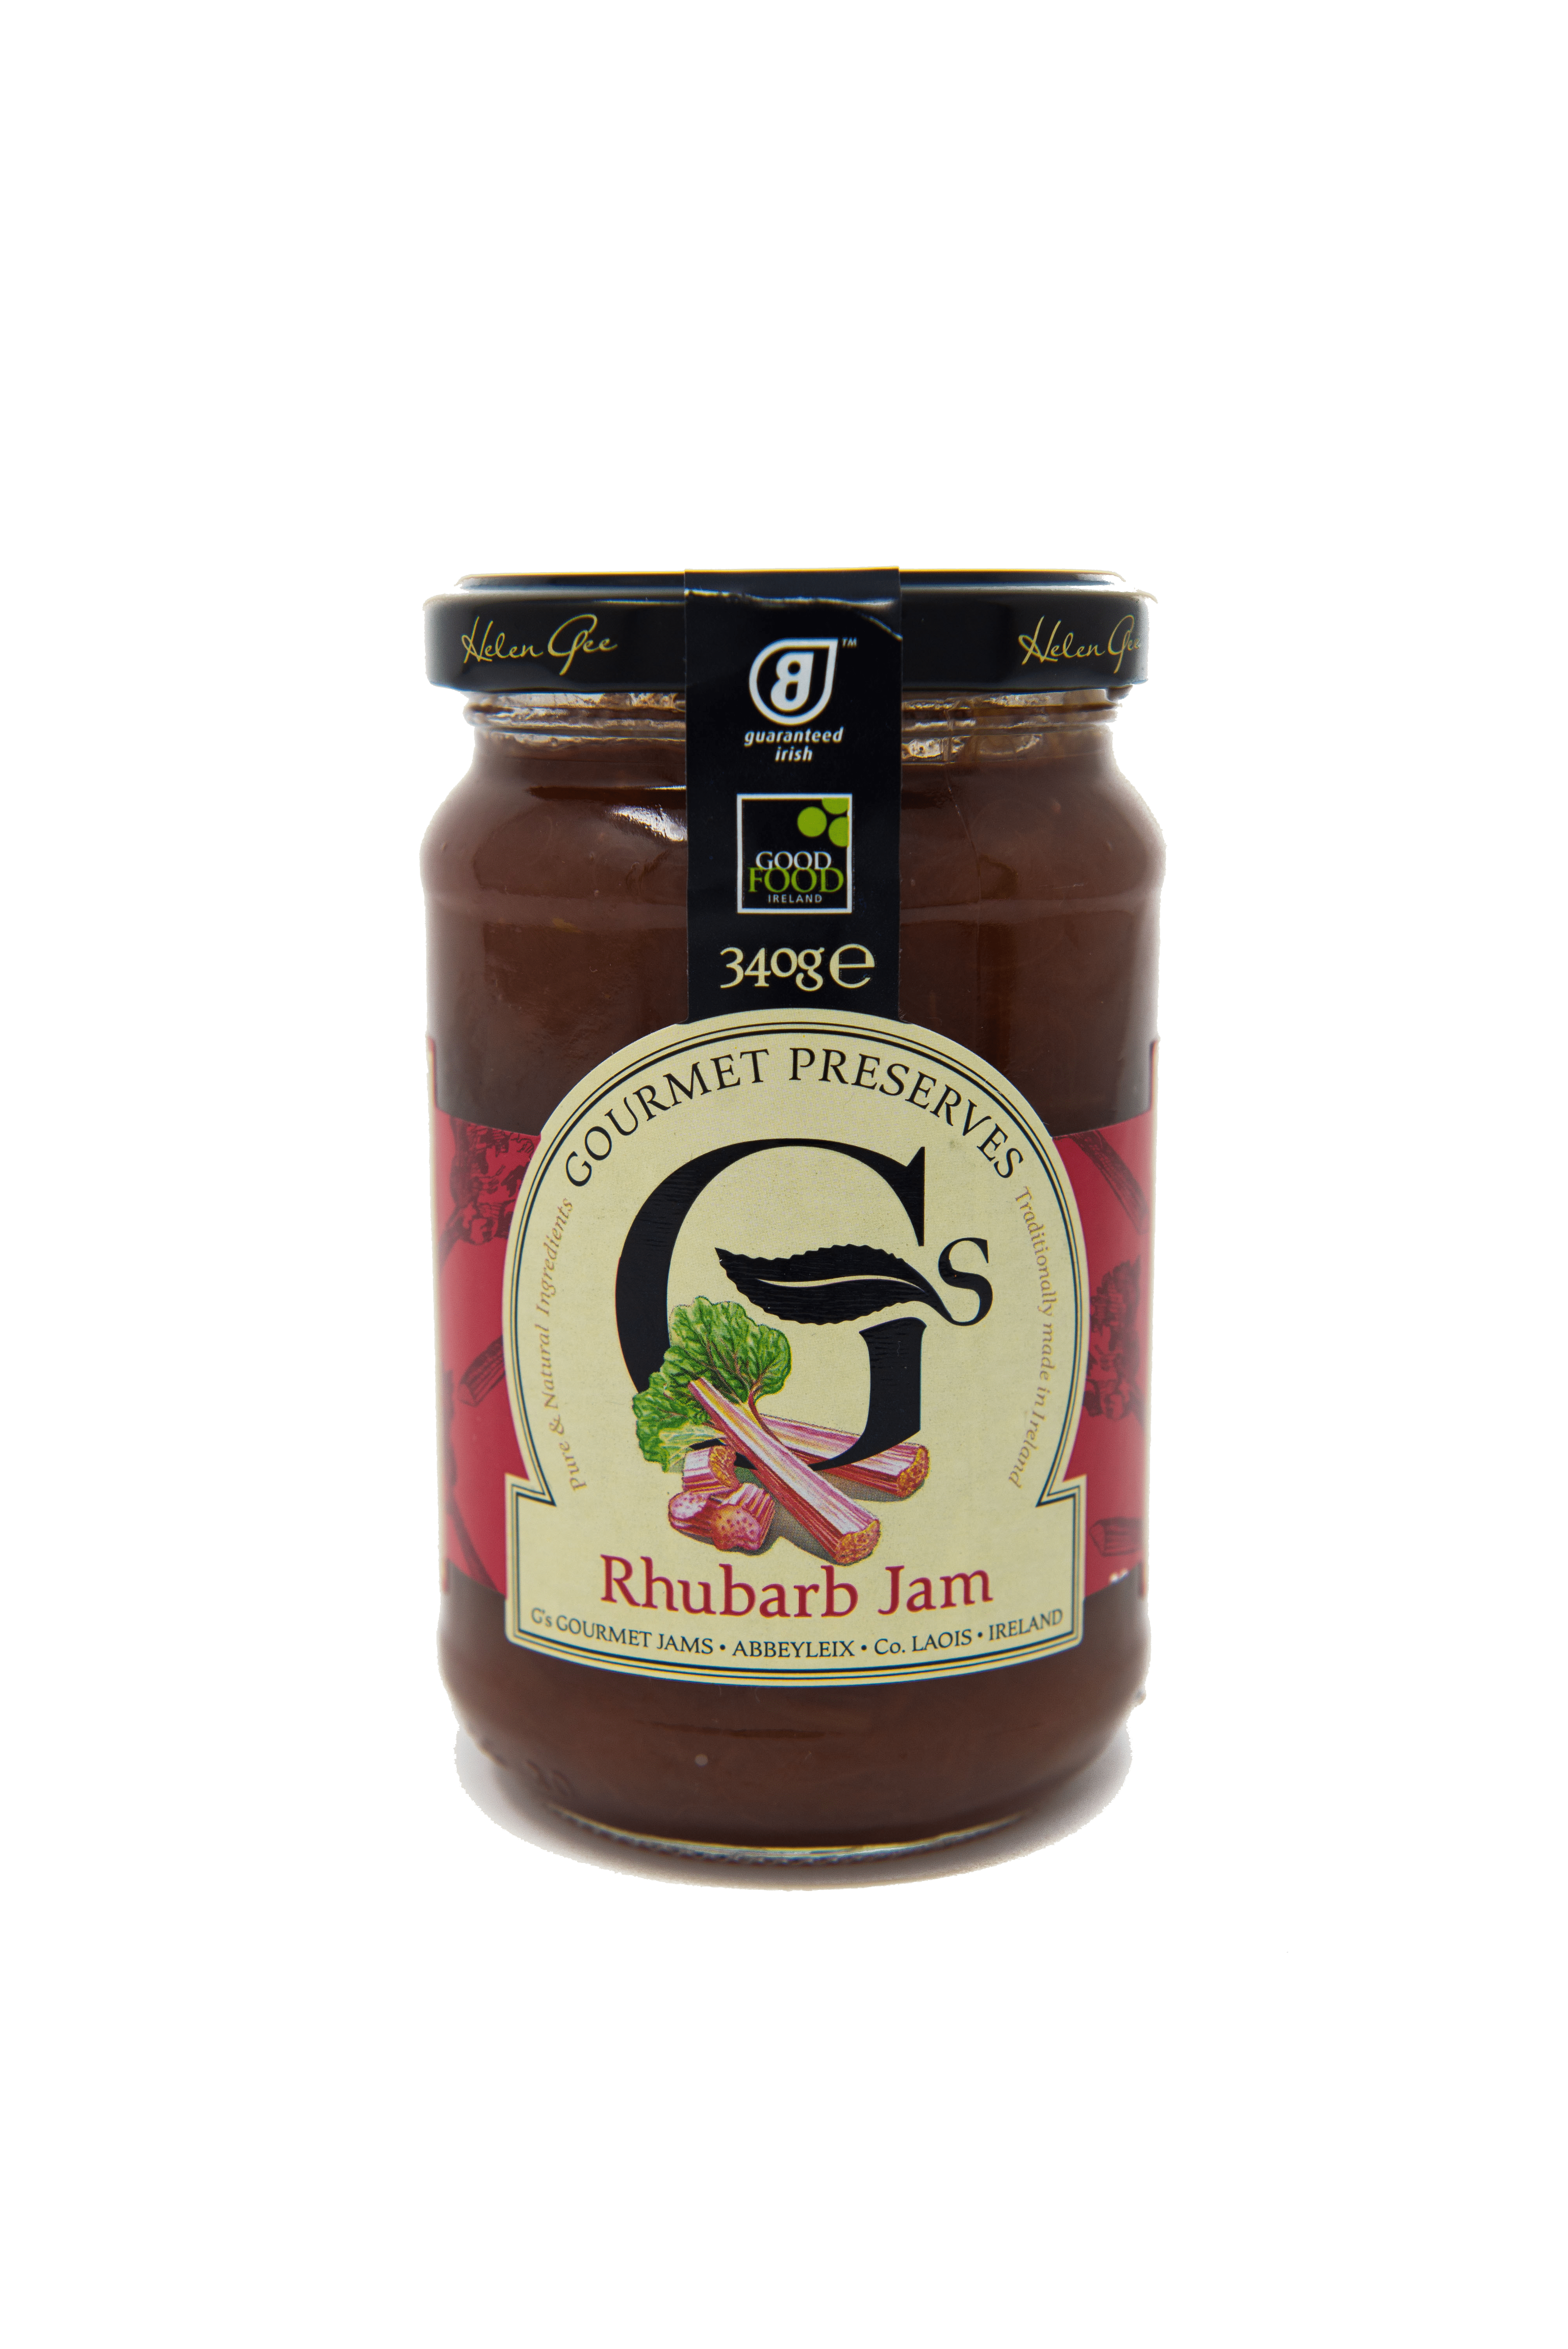 Rhubarb Jam Image